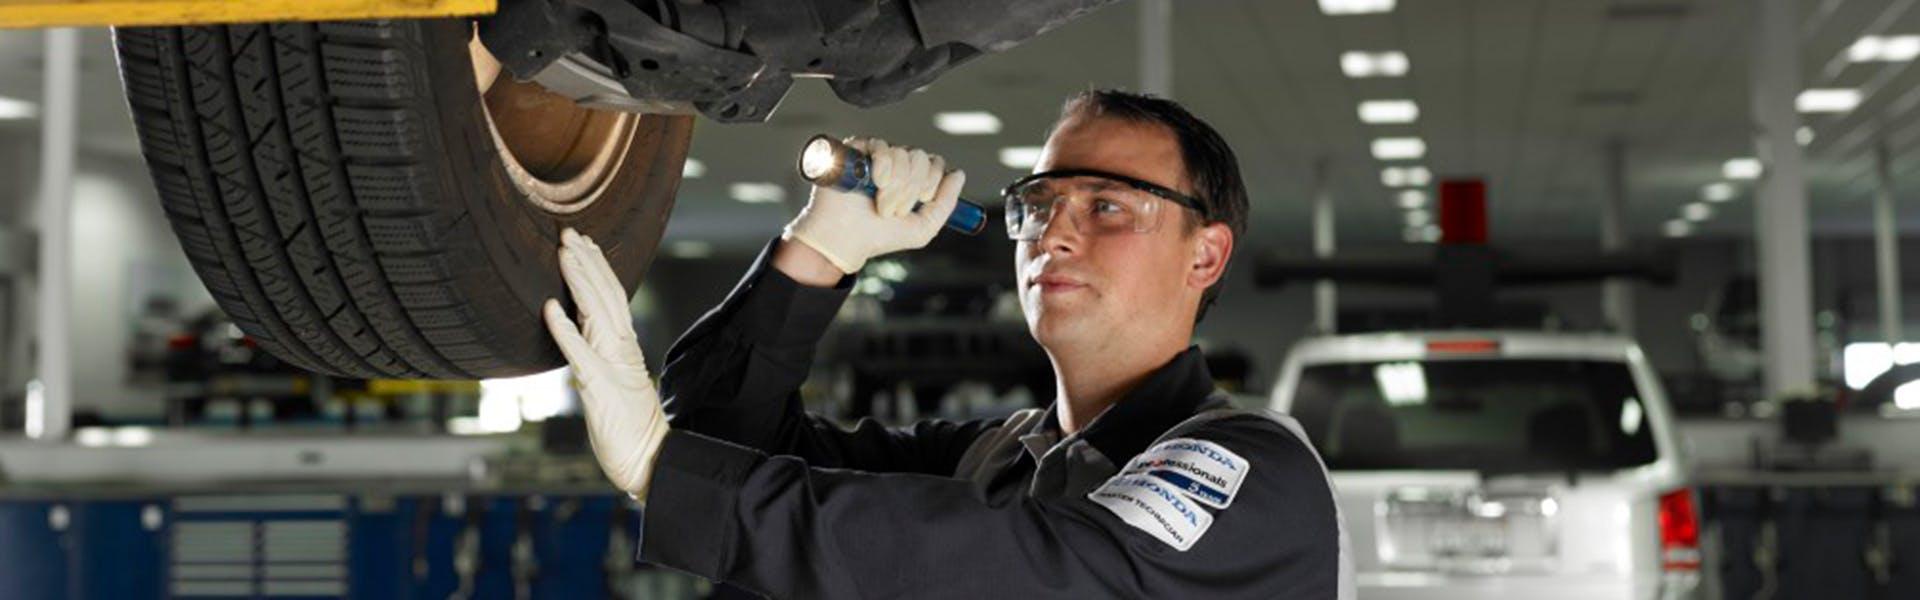 Washington Honda is a Honda Dealership in Washington near Bethel Park PA | Honda Service Advisor Replacing Tire on Honda Vehicle